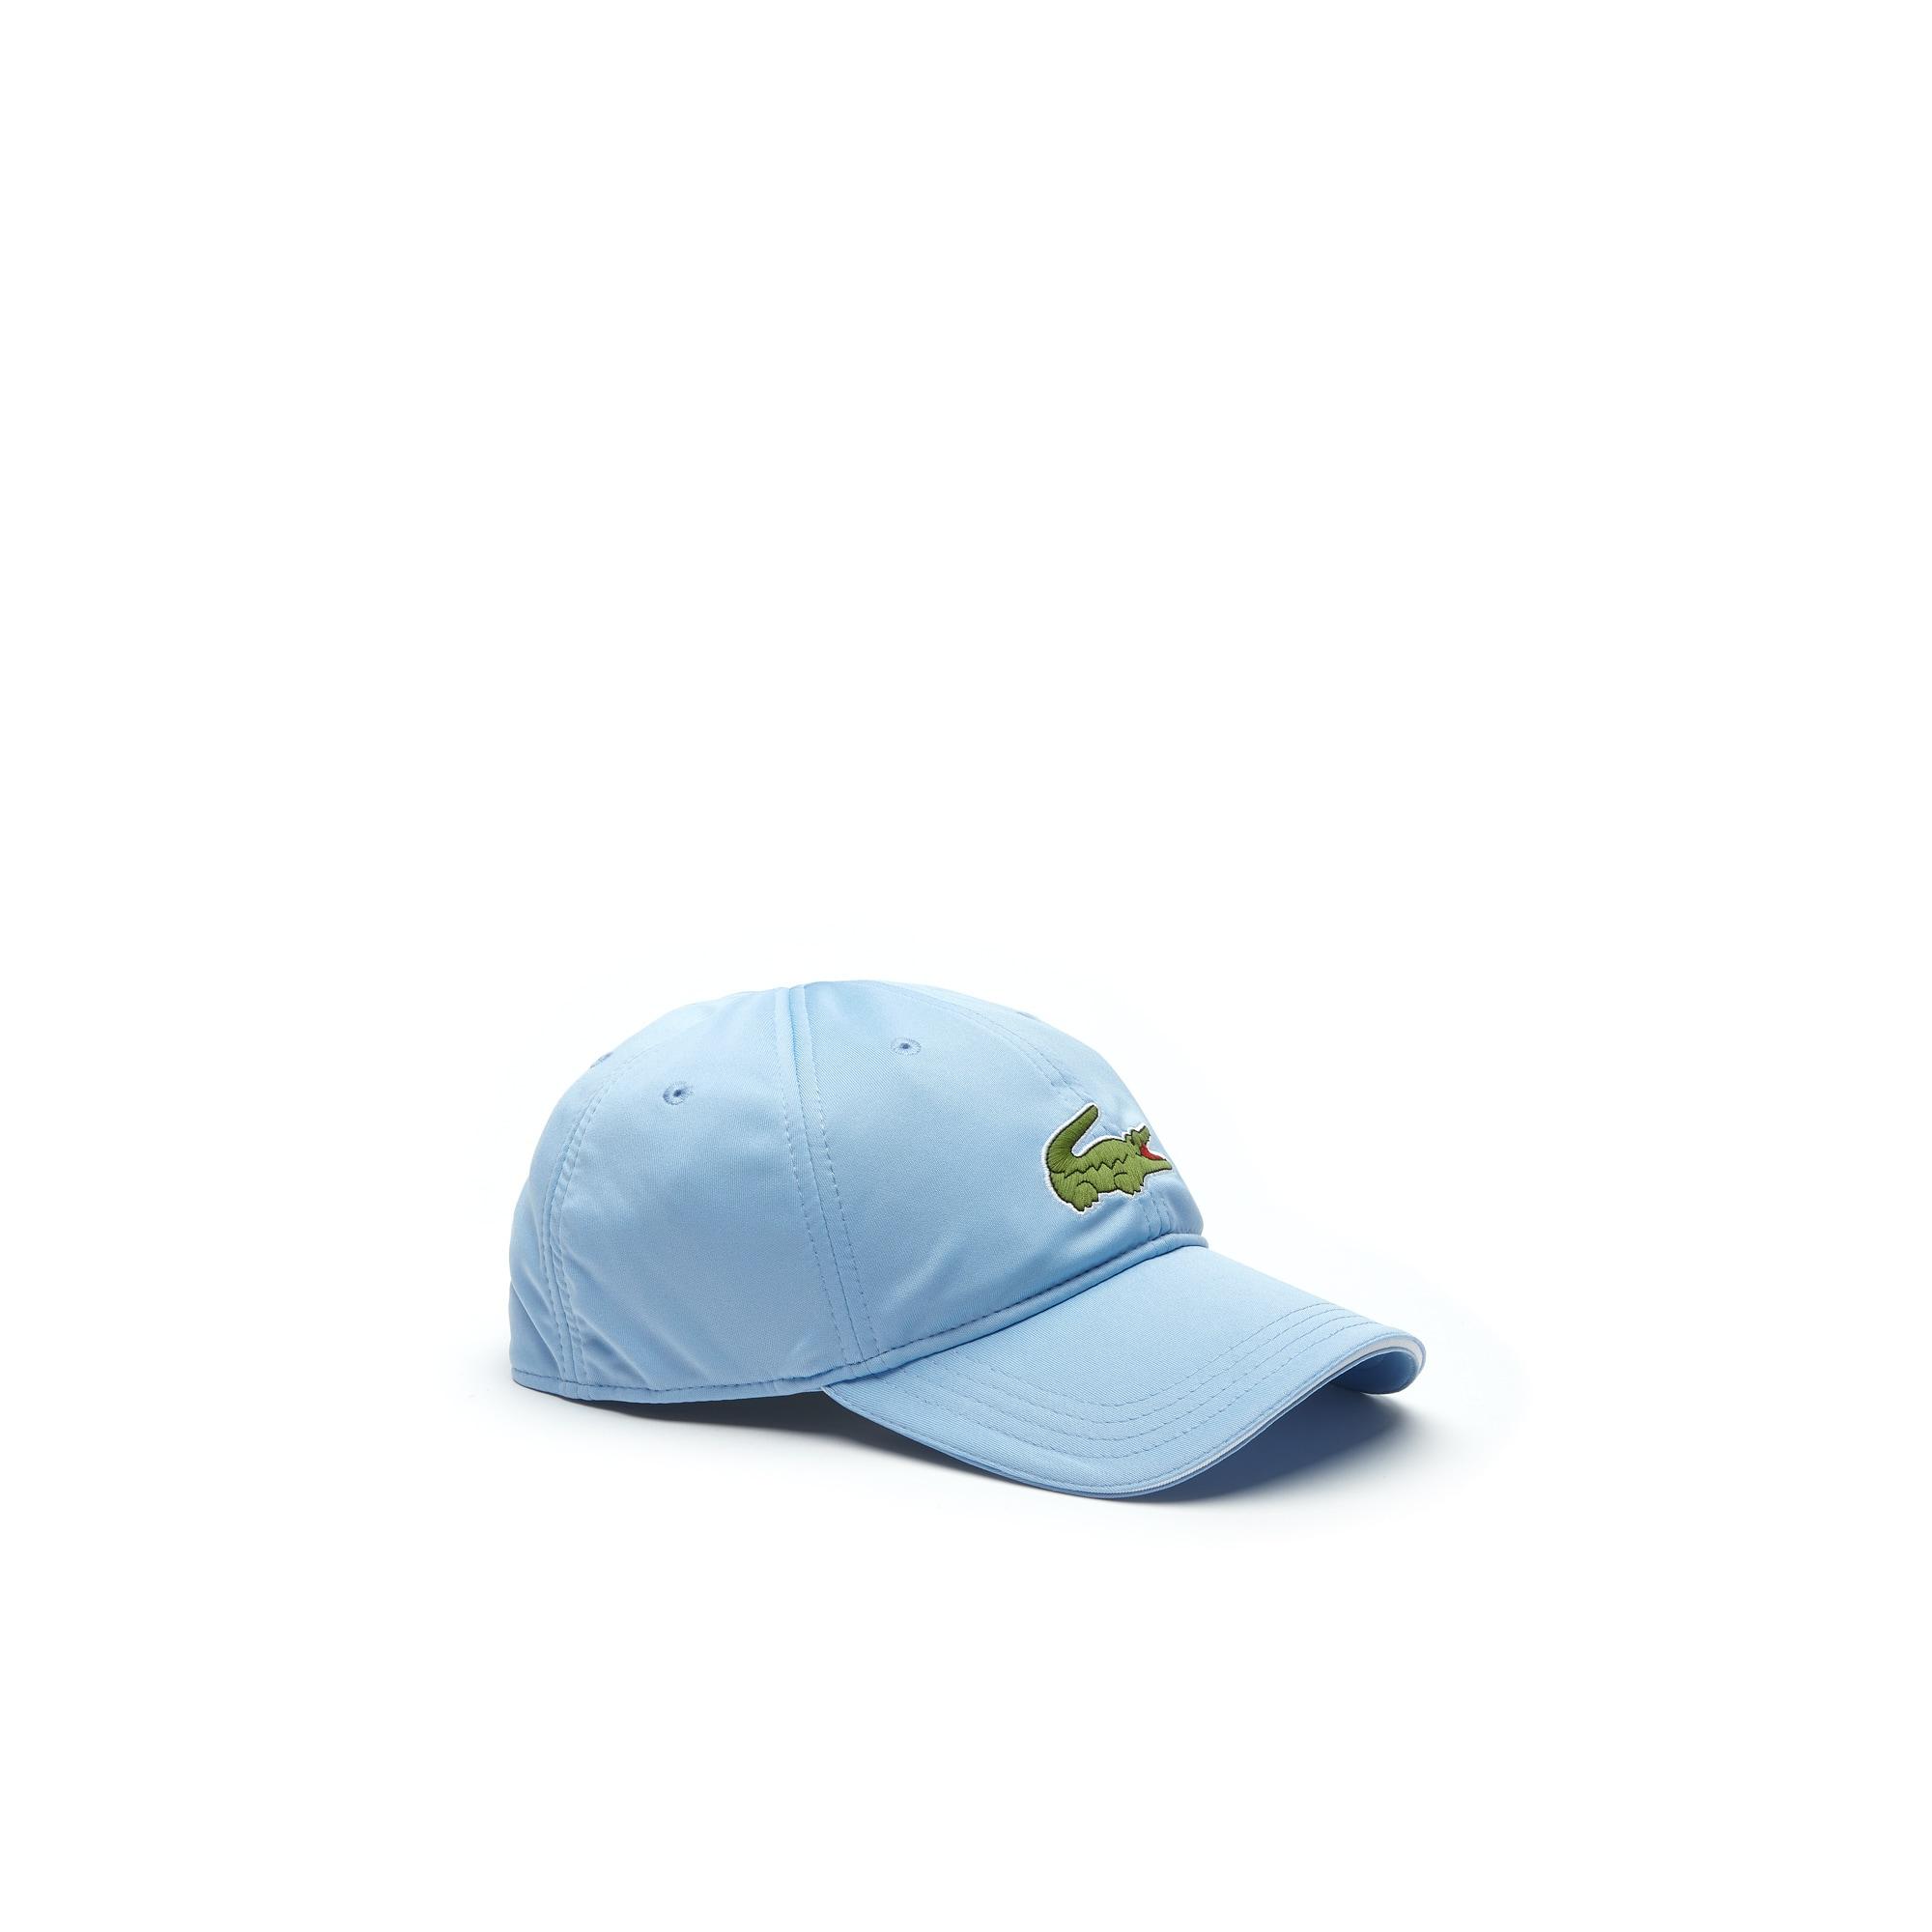 Unisex SPORT Miami Open Technical Jersey Tennis Cap